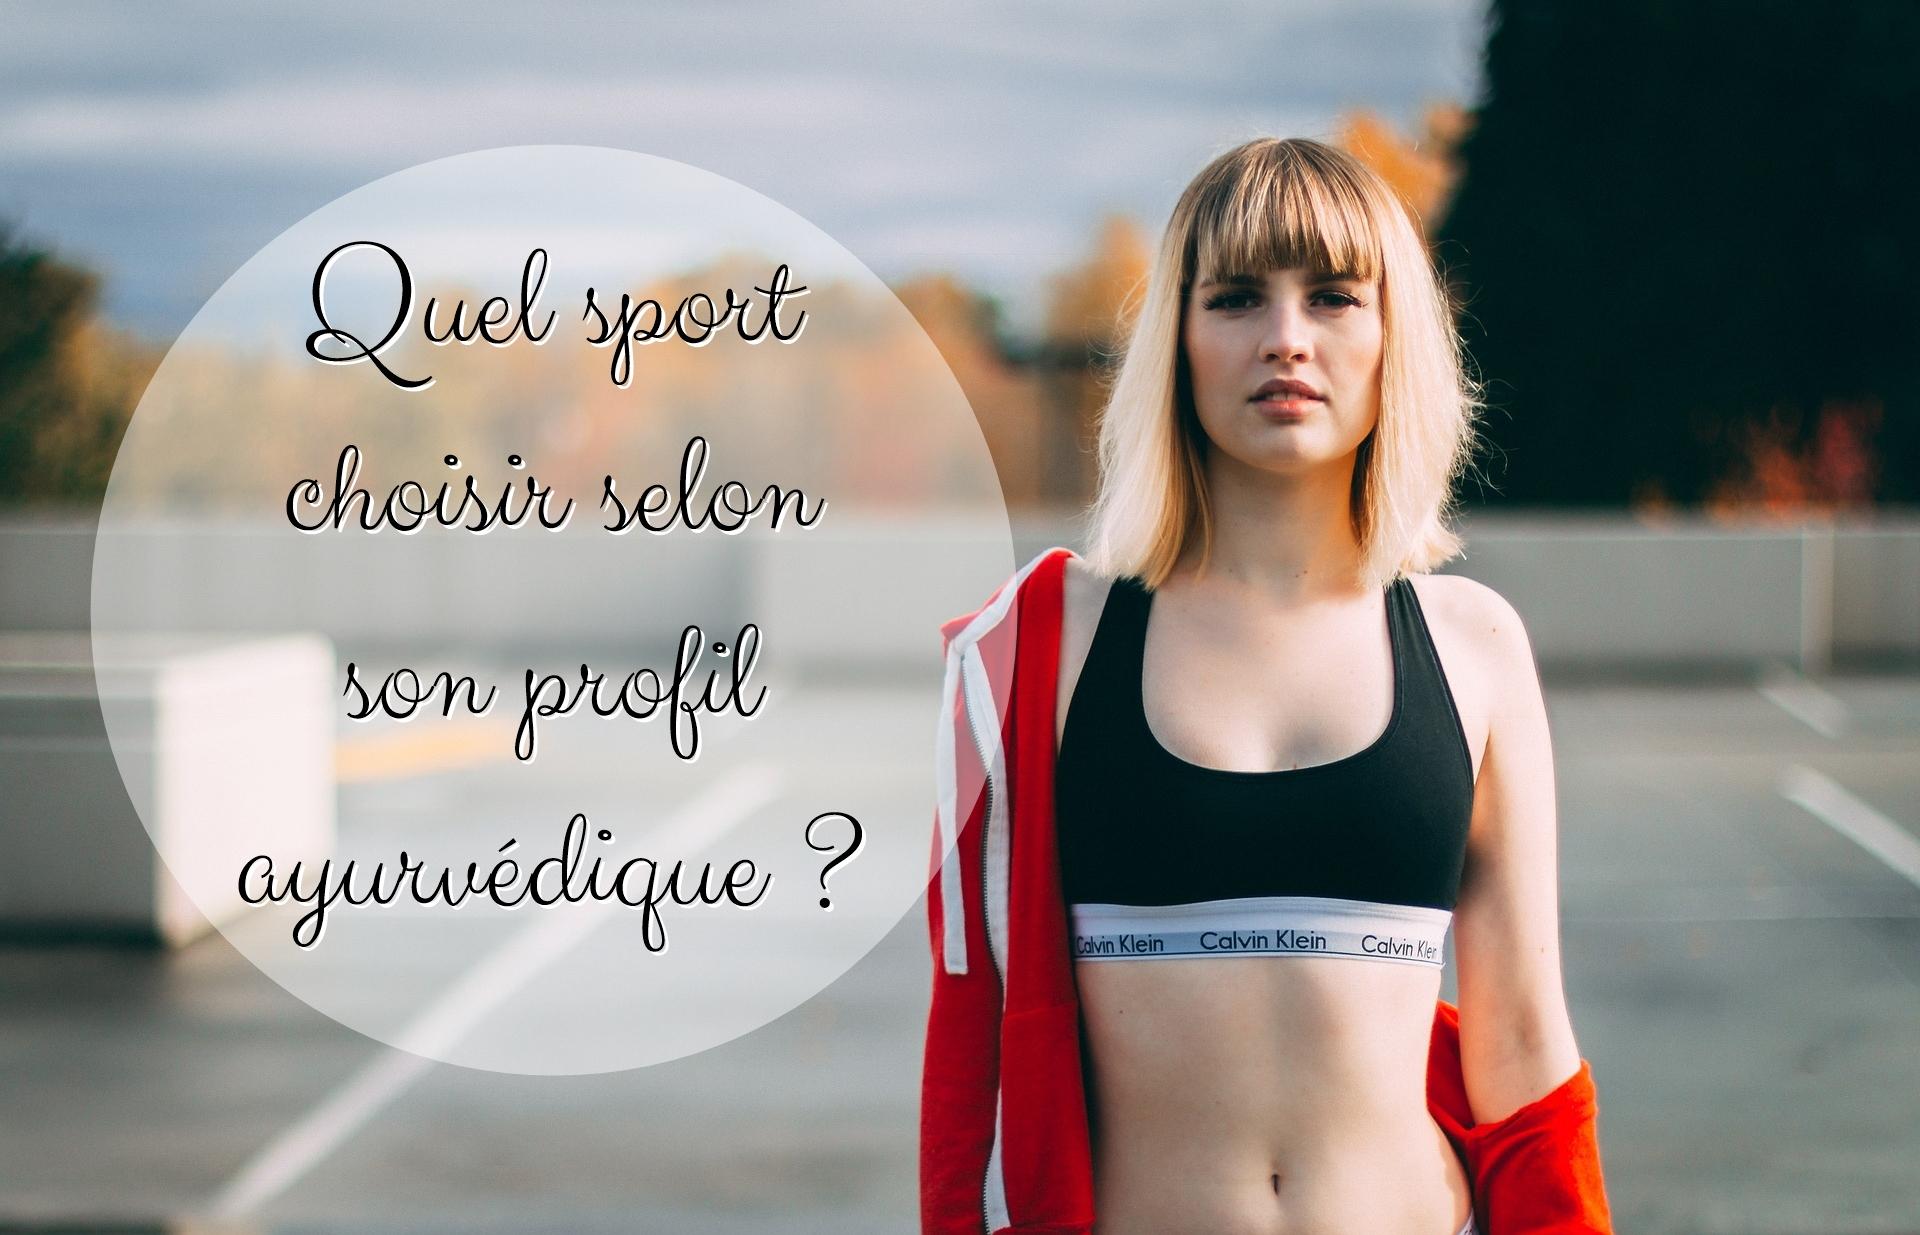 Quel sport choisir selon son profil ayurvédique ?